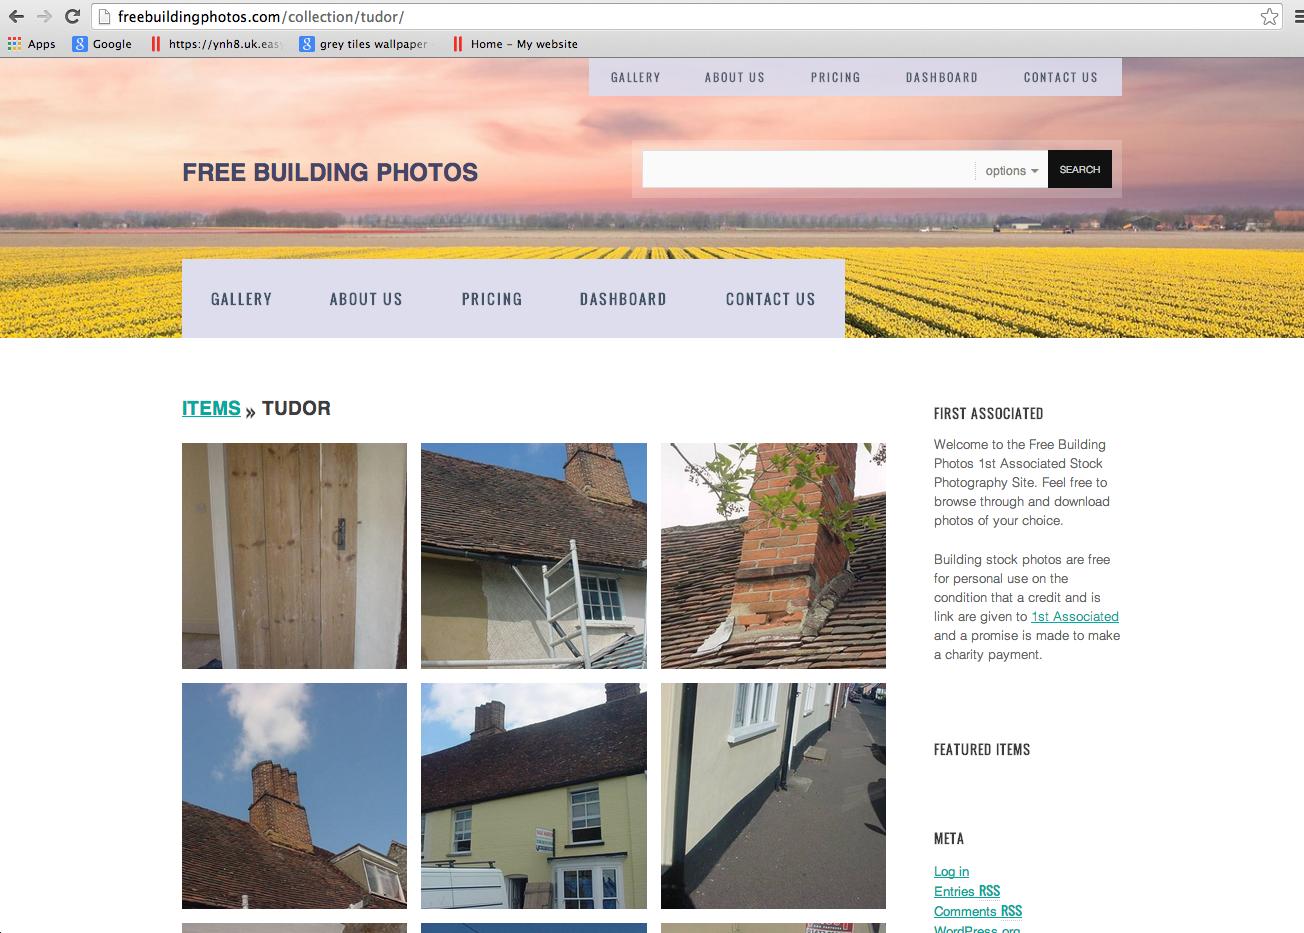 FreeBuildingPhotos's Collection - Tudor Item